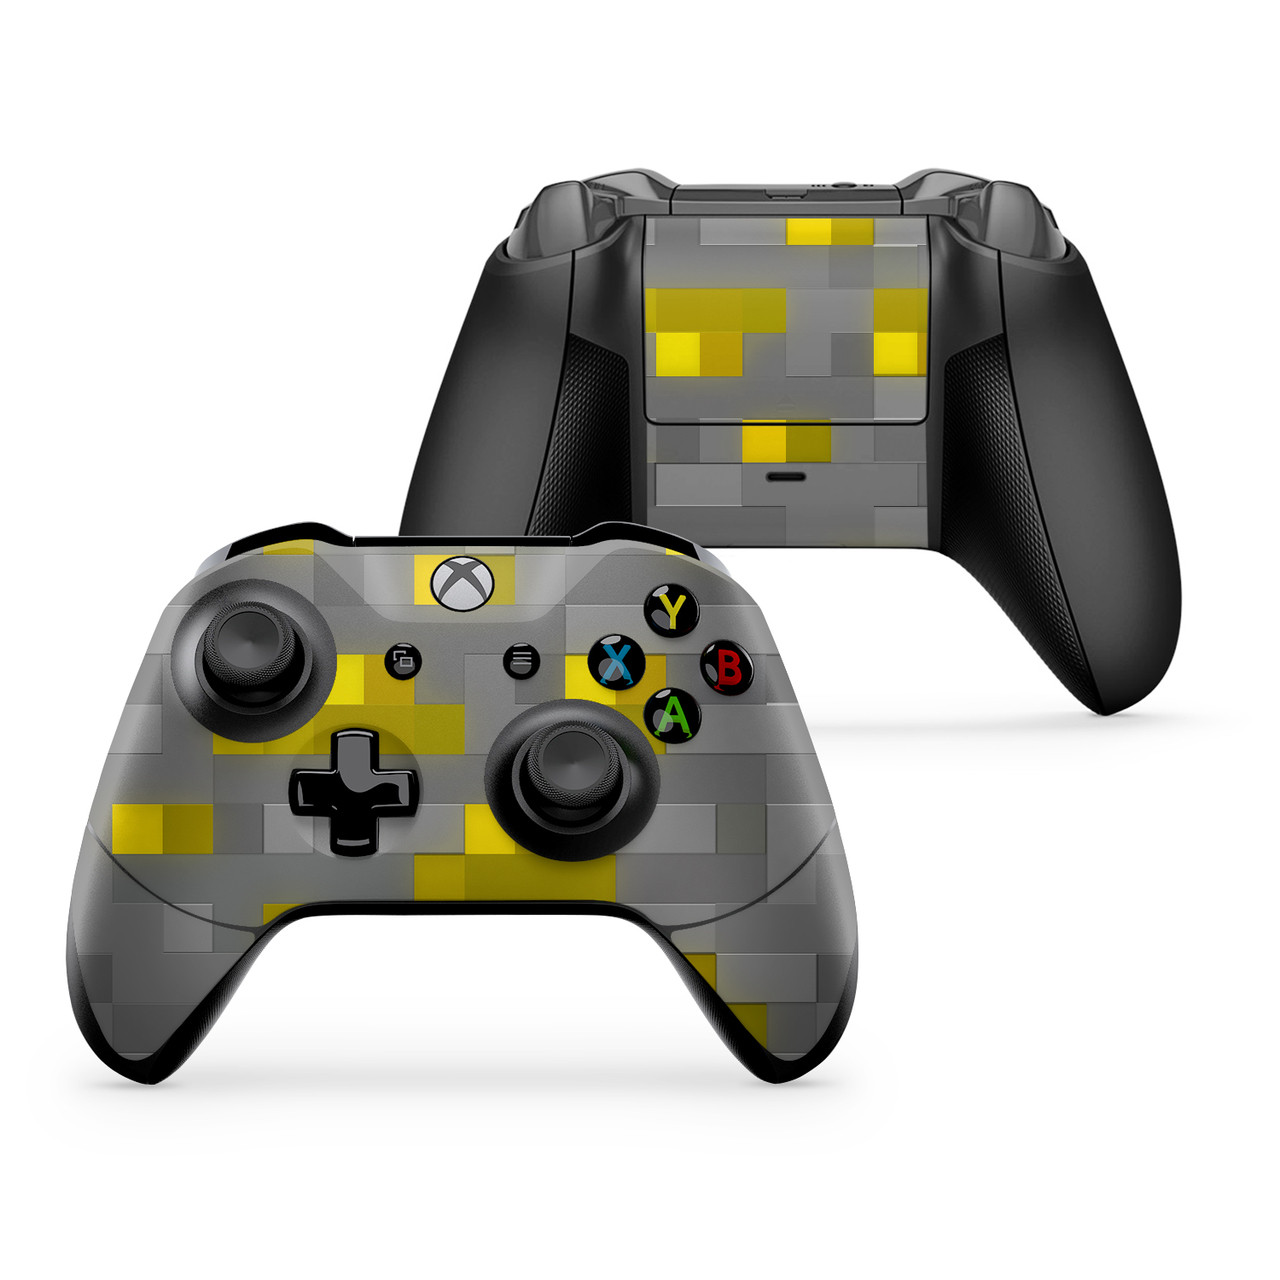 Pixel Gold Block Xbox One X Controller Minecraft Art